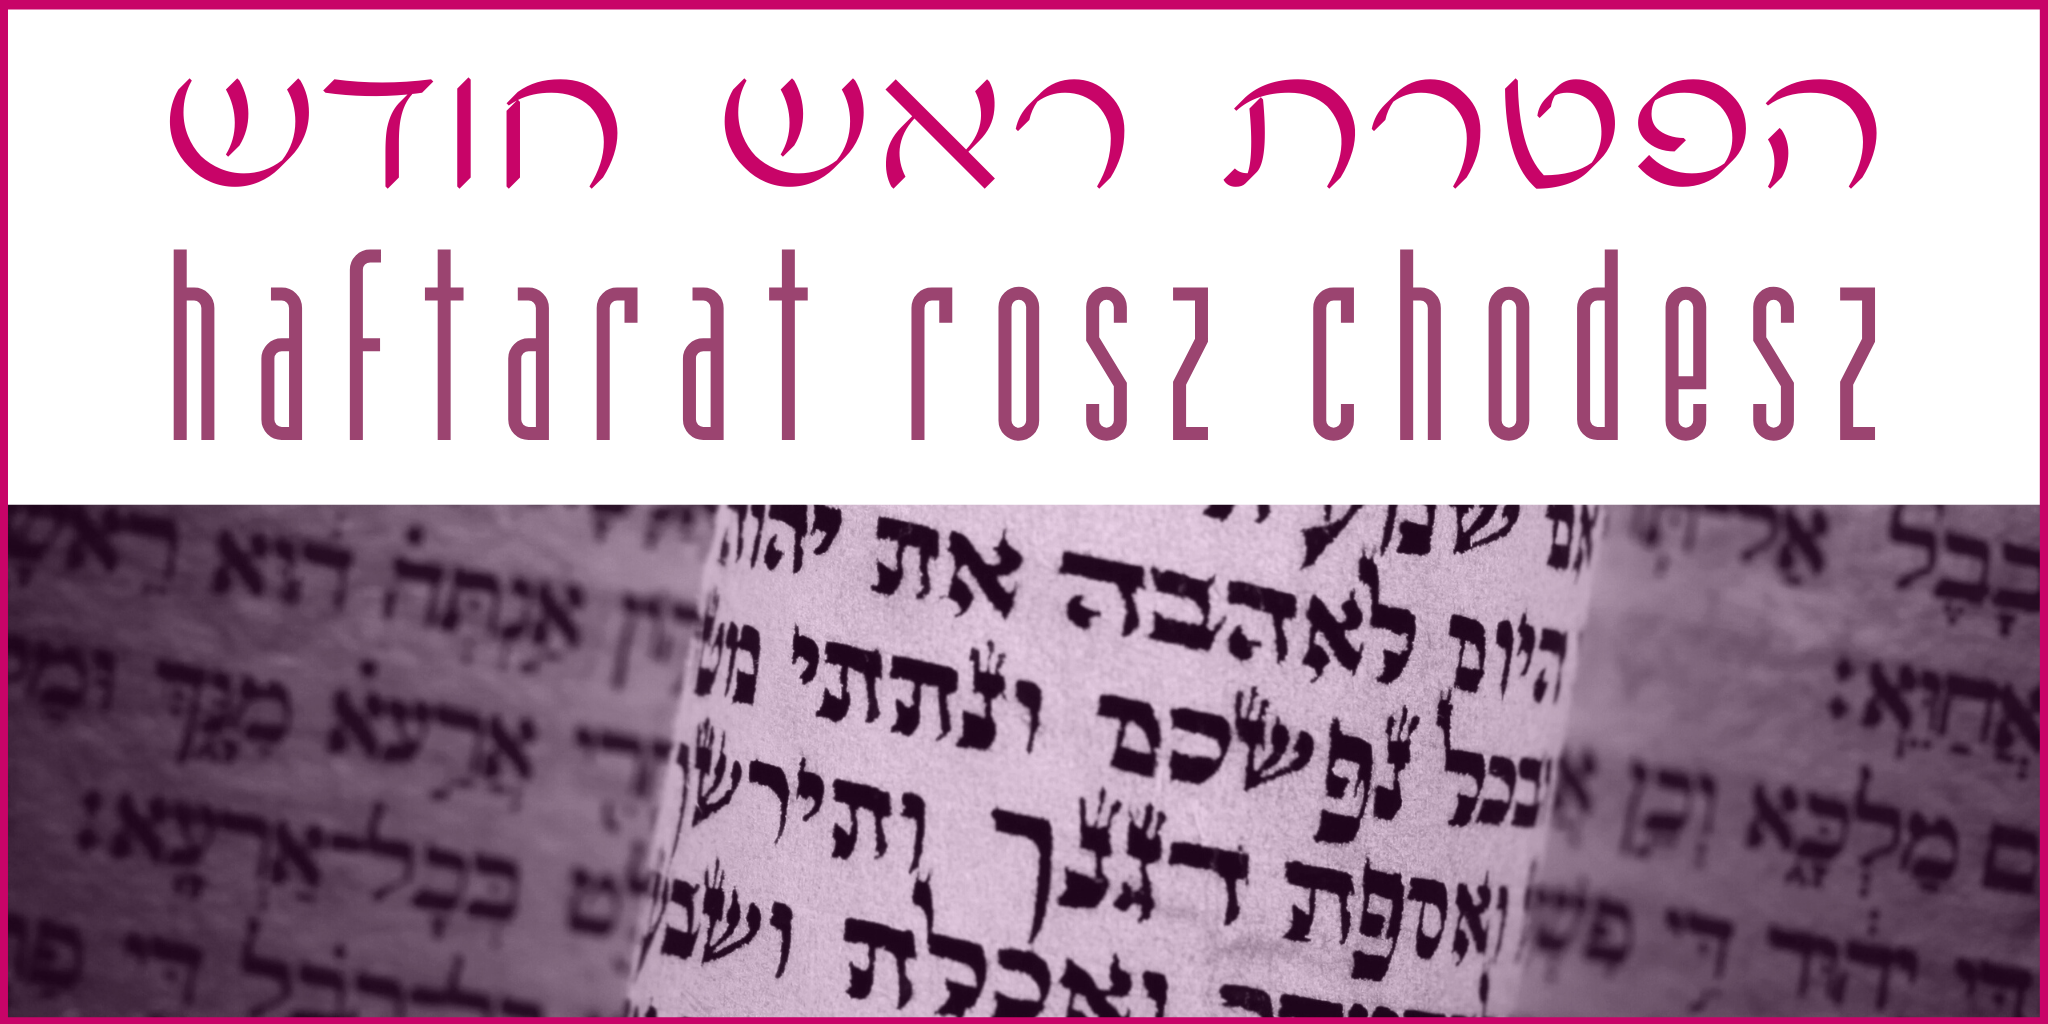 Haftarat Rosz Chodesz